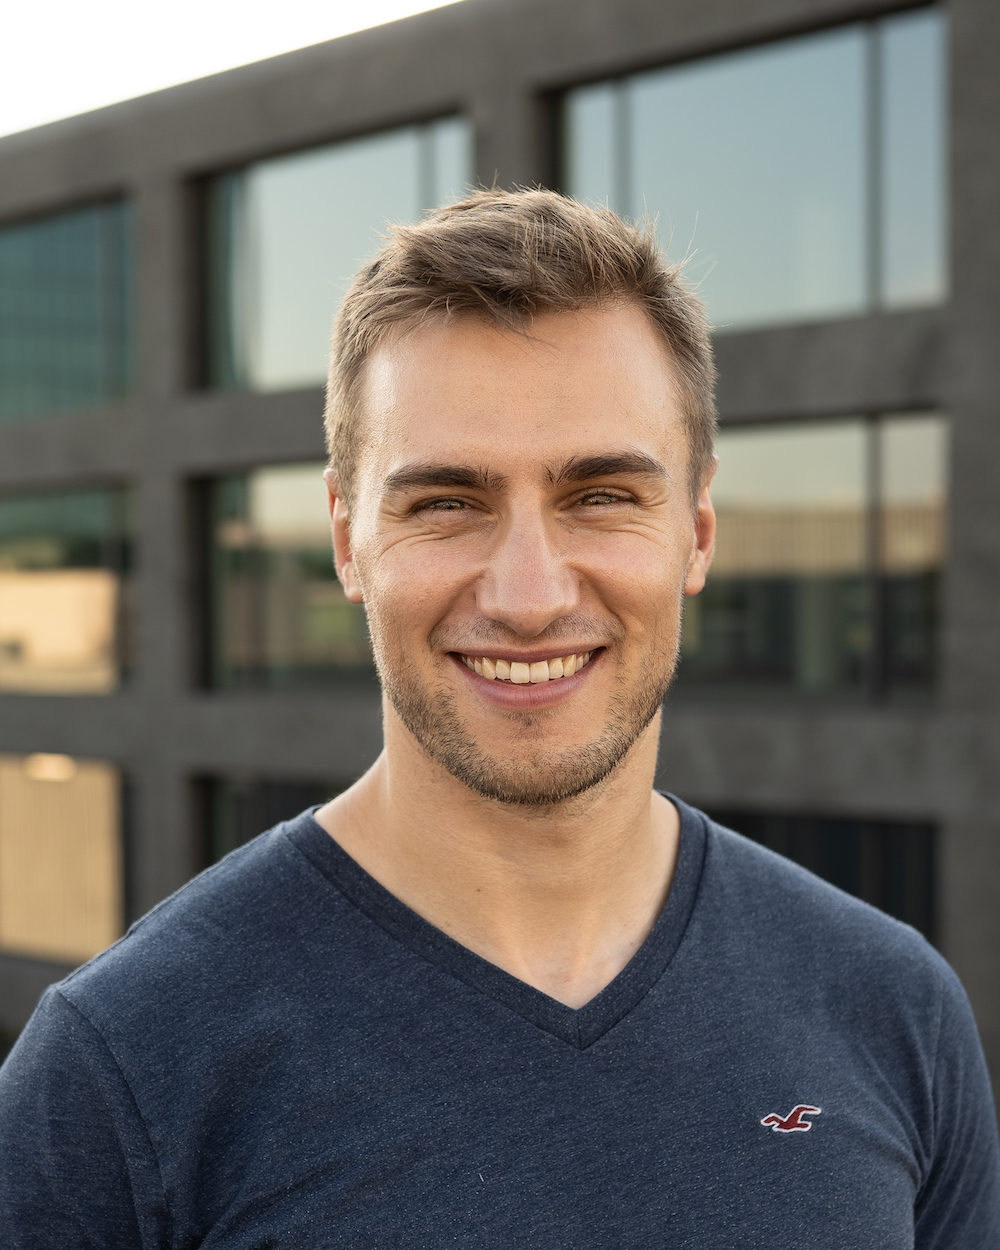 Silvan Krähenbühl, Ecosystem builder, sales enthusiast and podcast host